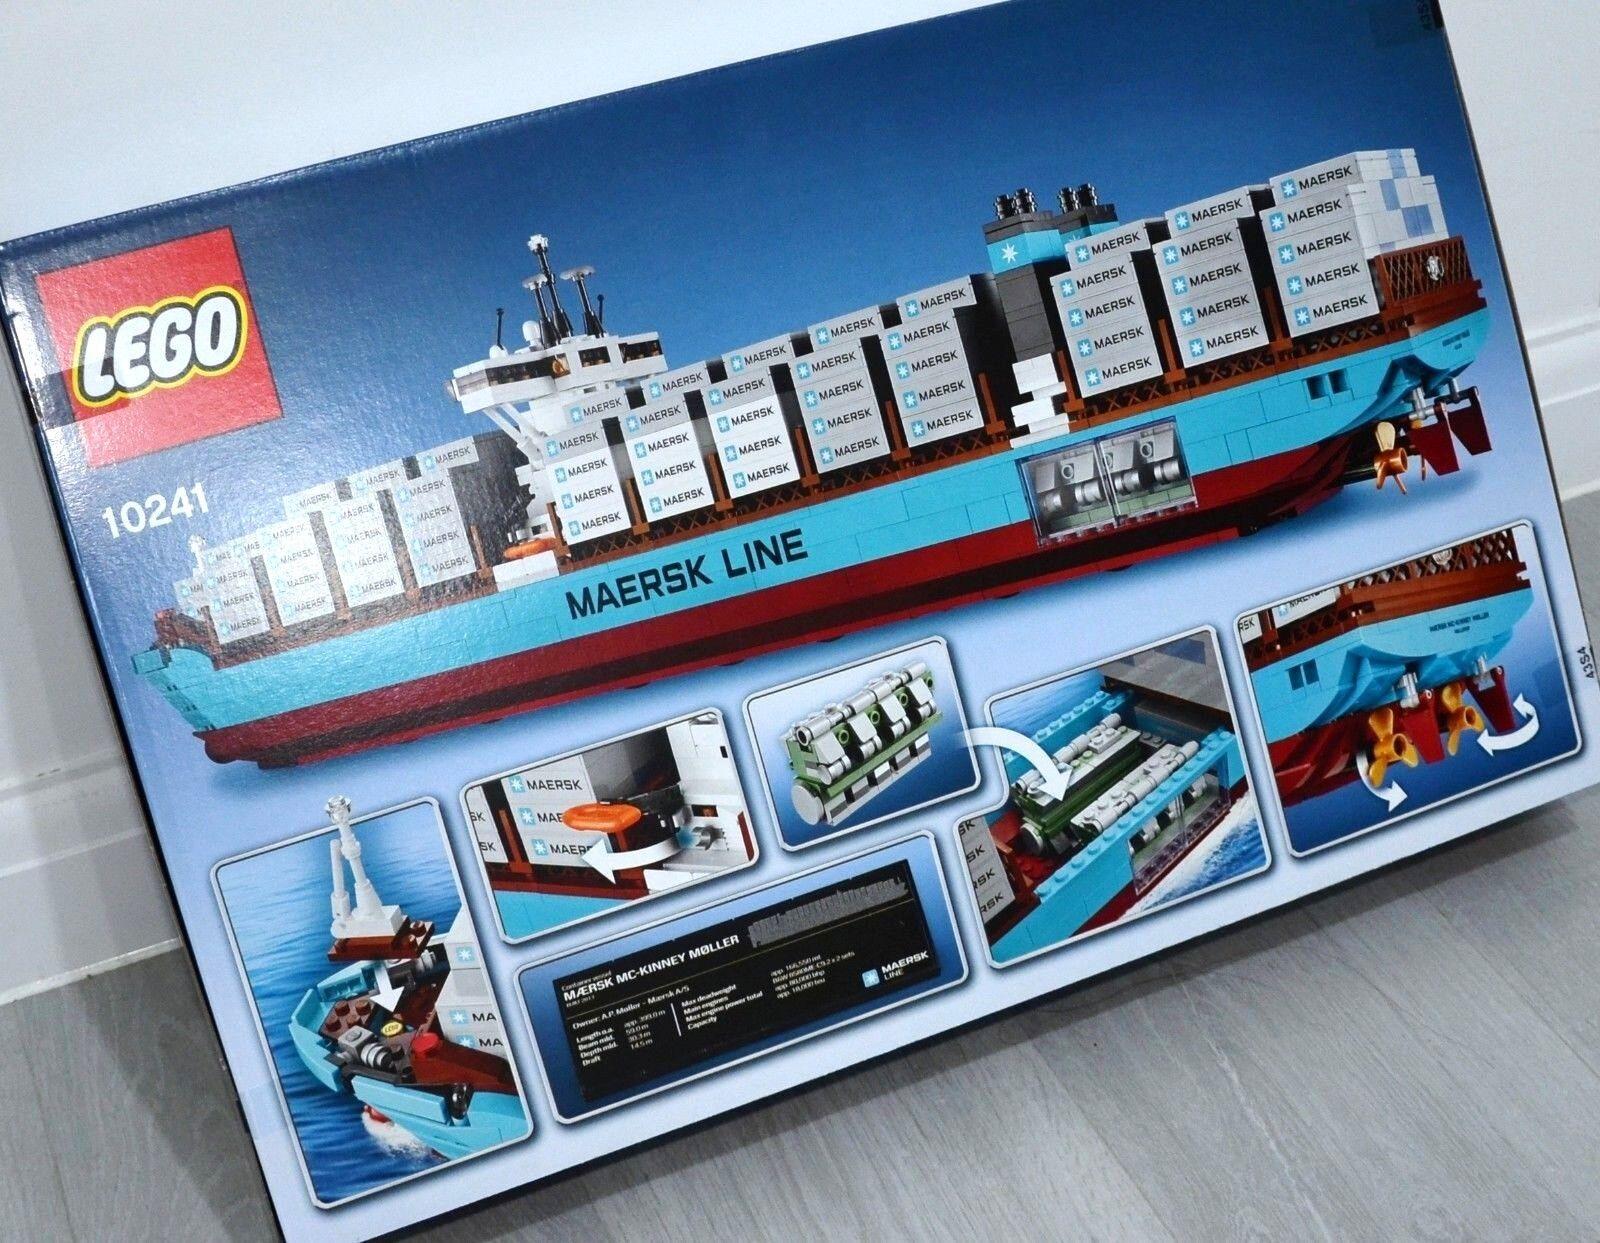 Lego Creator 10241 Maersk Line Triple E Model Container Container Container Vessel Mc Kinney Moller b191e5